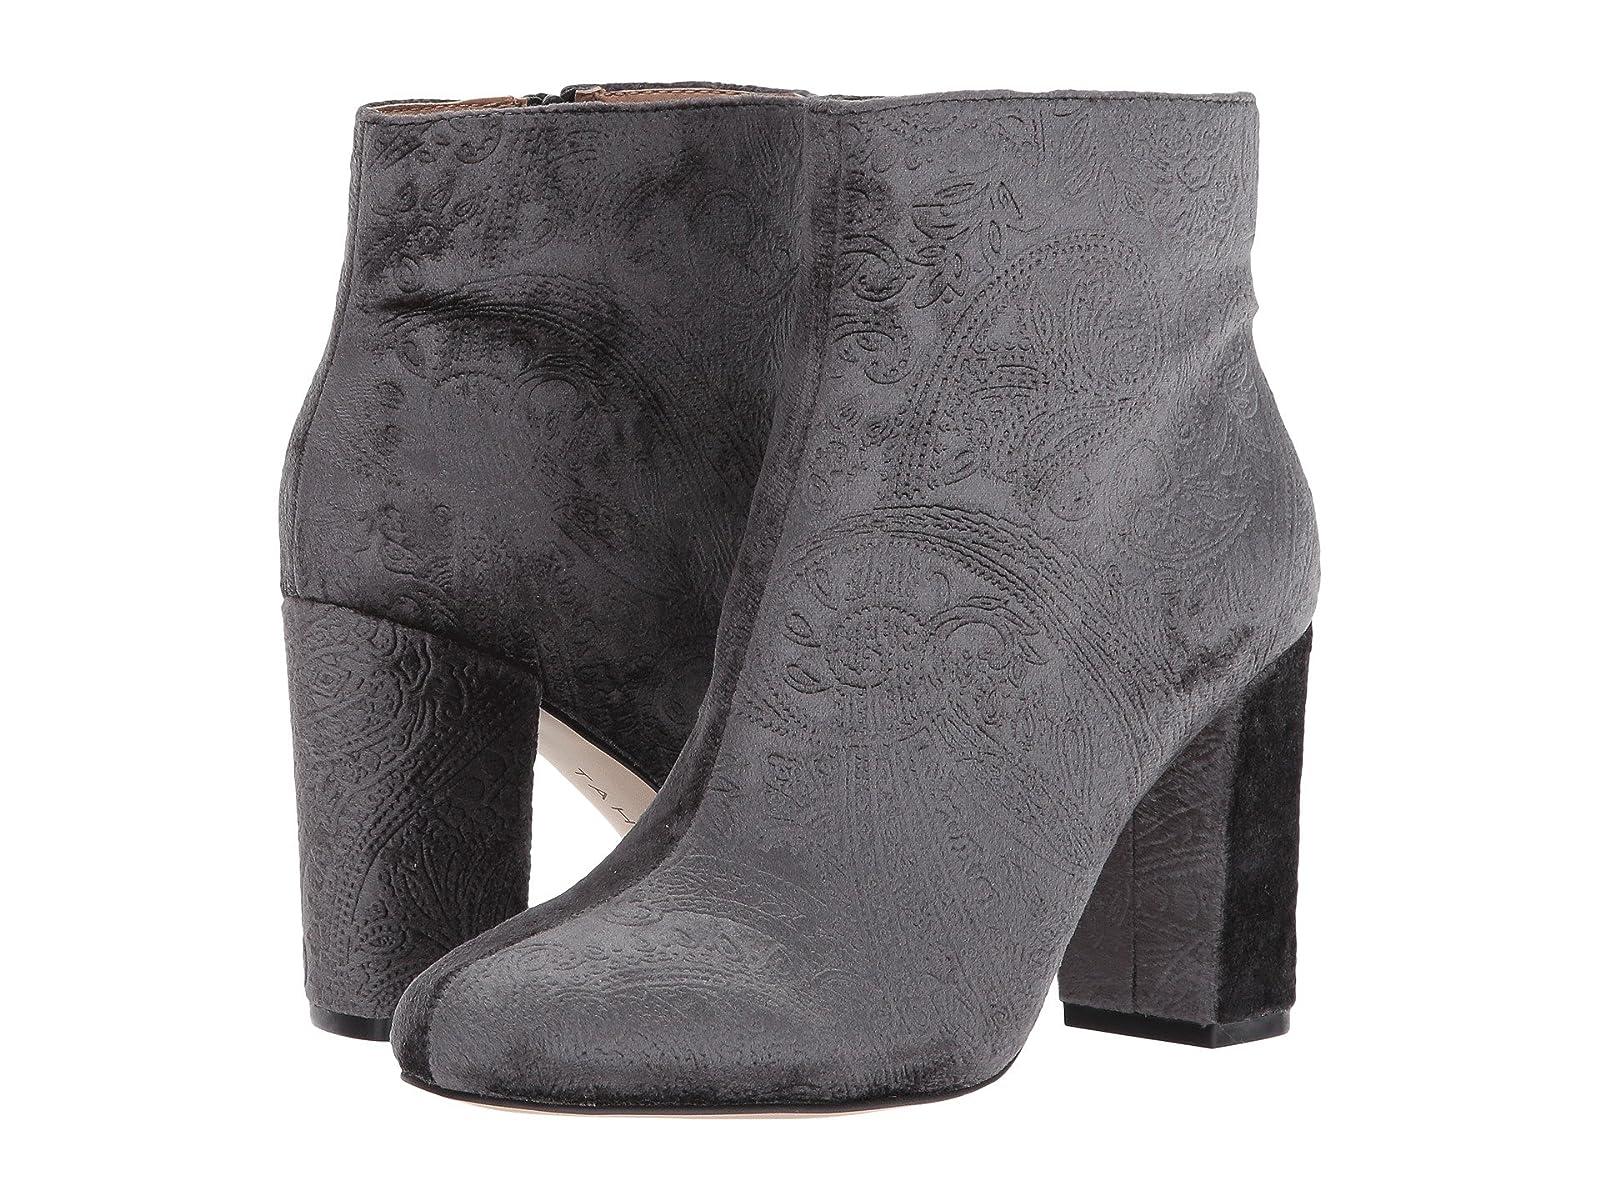 Tahari SelenaCheap and distinctive eye-catching shoes